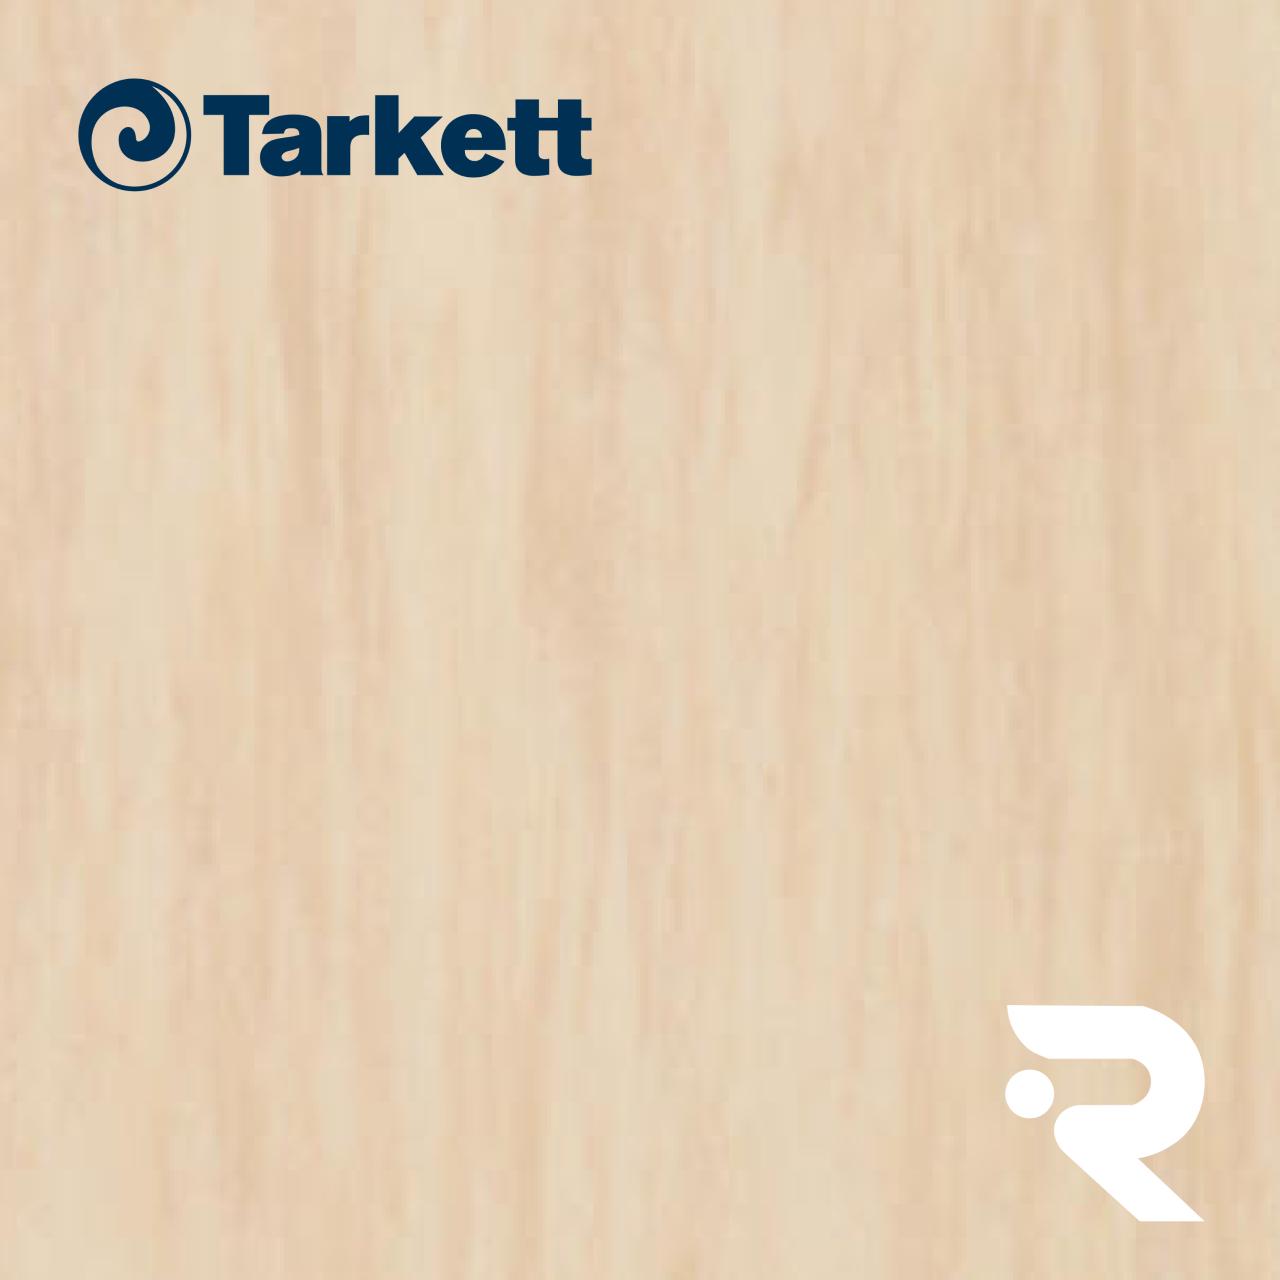 🏫 Гомогенный линолеум Tarkett   Standard SAND 0913   Standard Plus 2.0 mm   610 х 610 мм